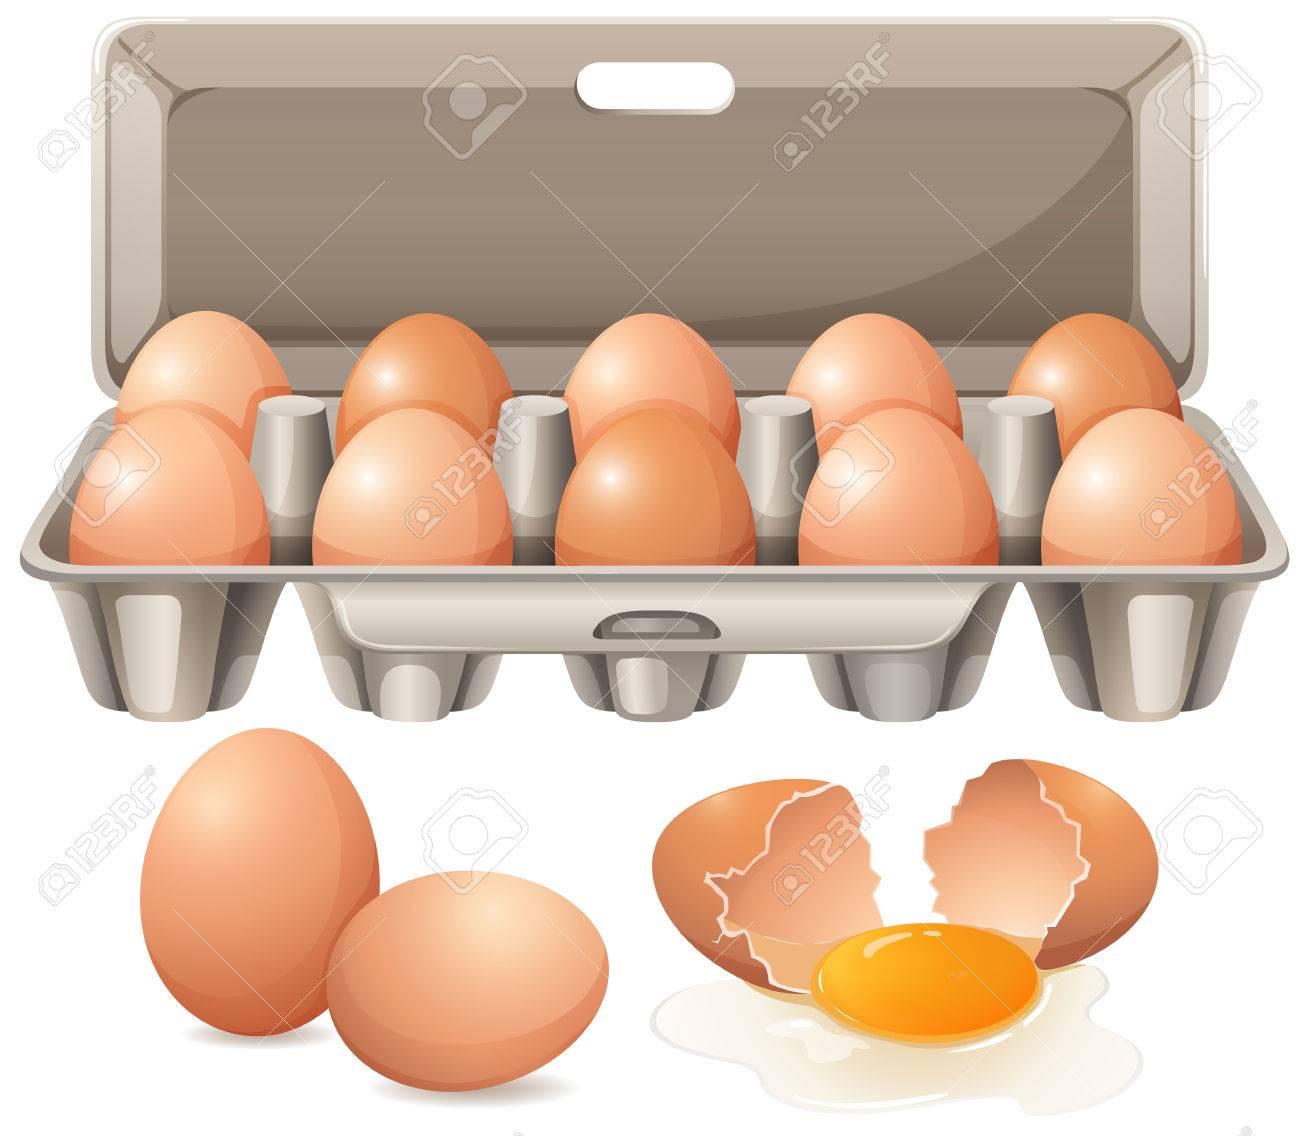 Carton of eggs and raw egg yolk illustration.